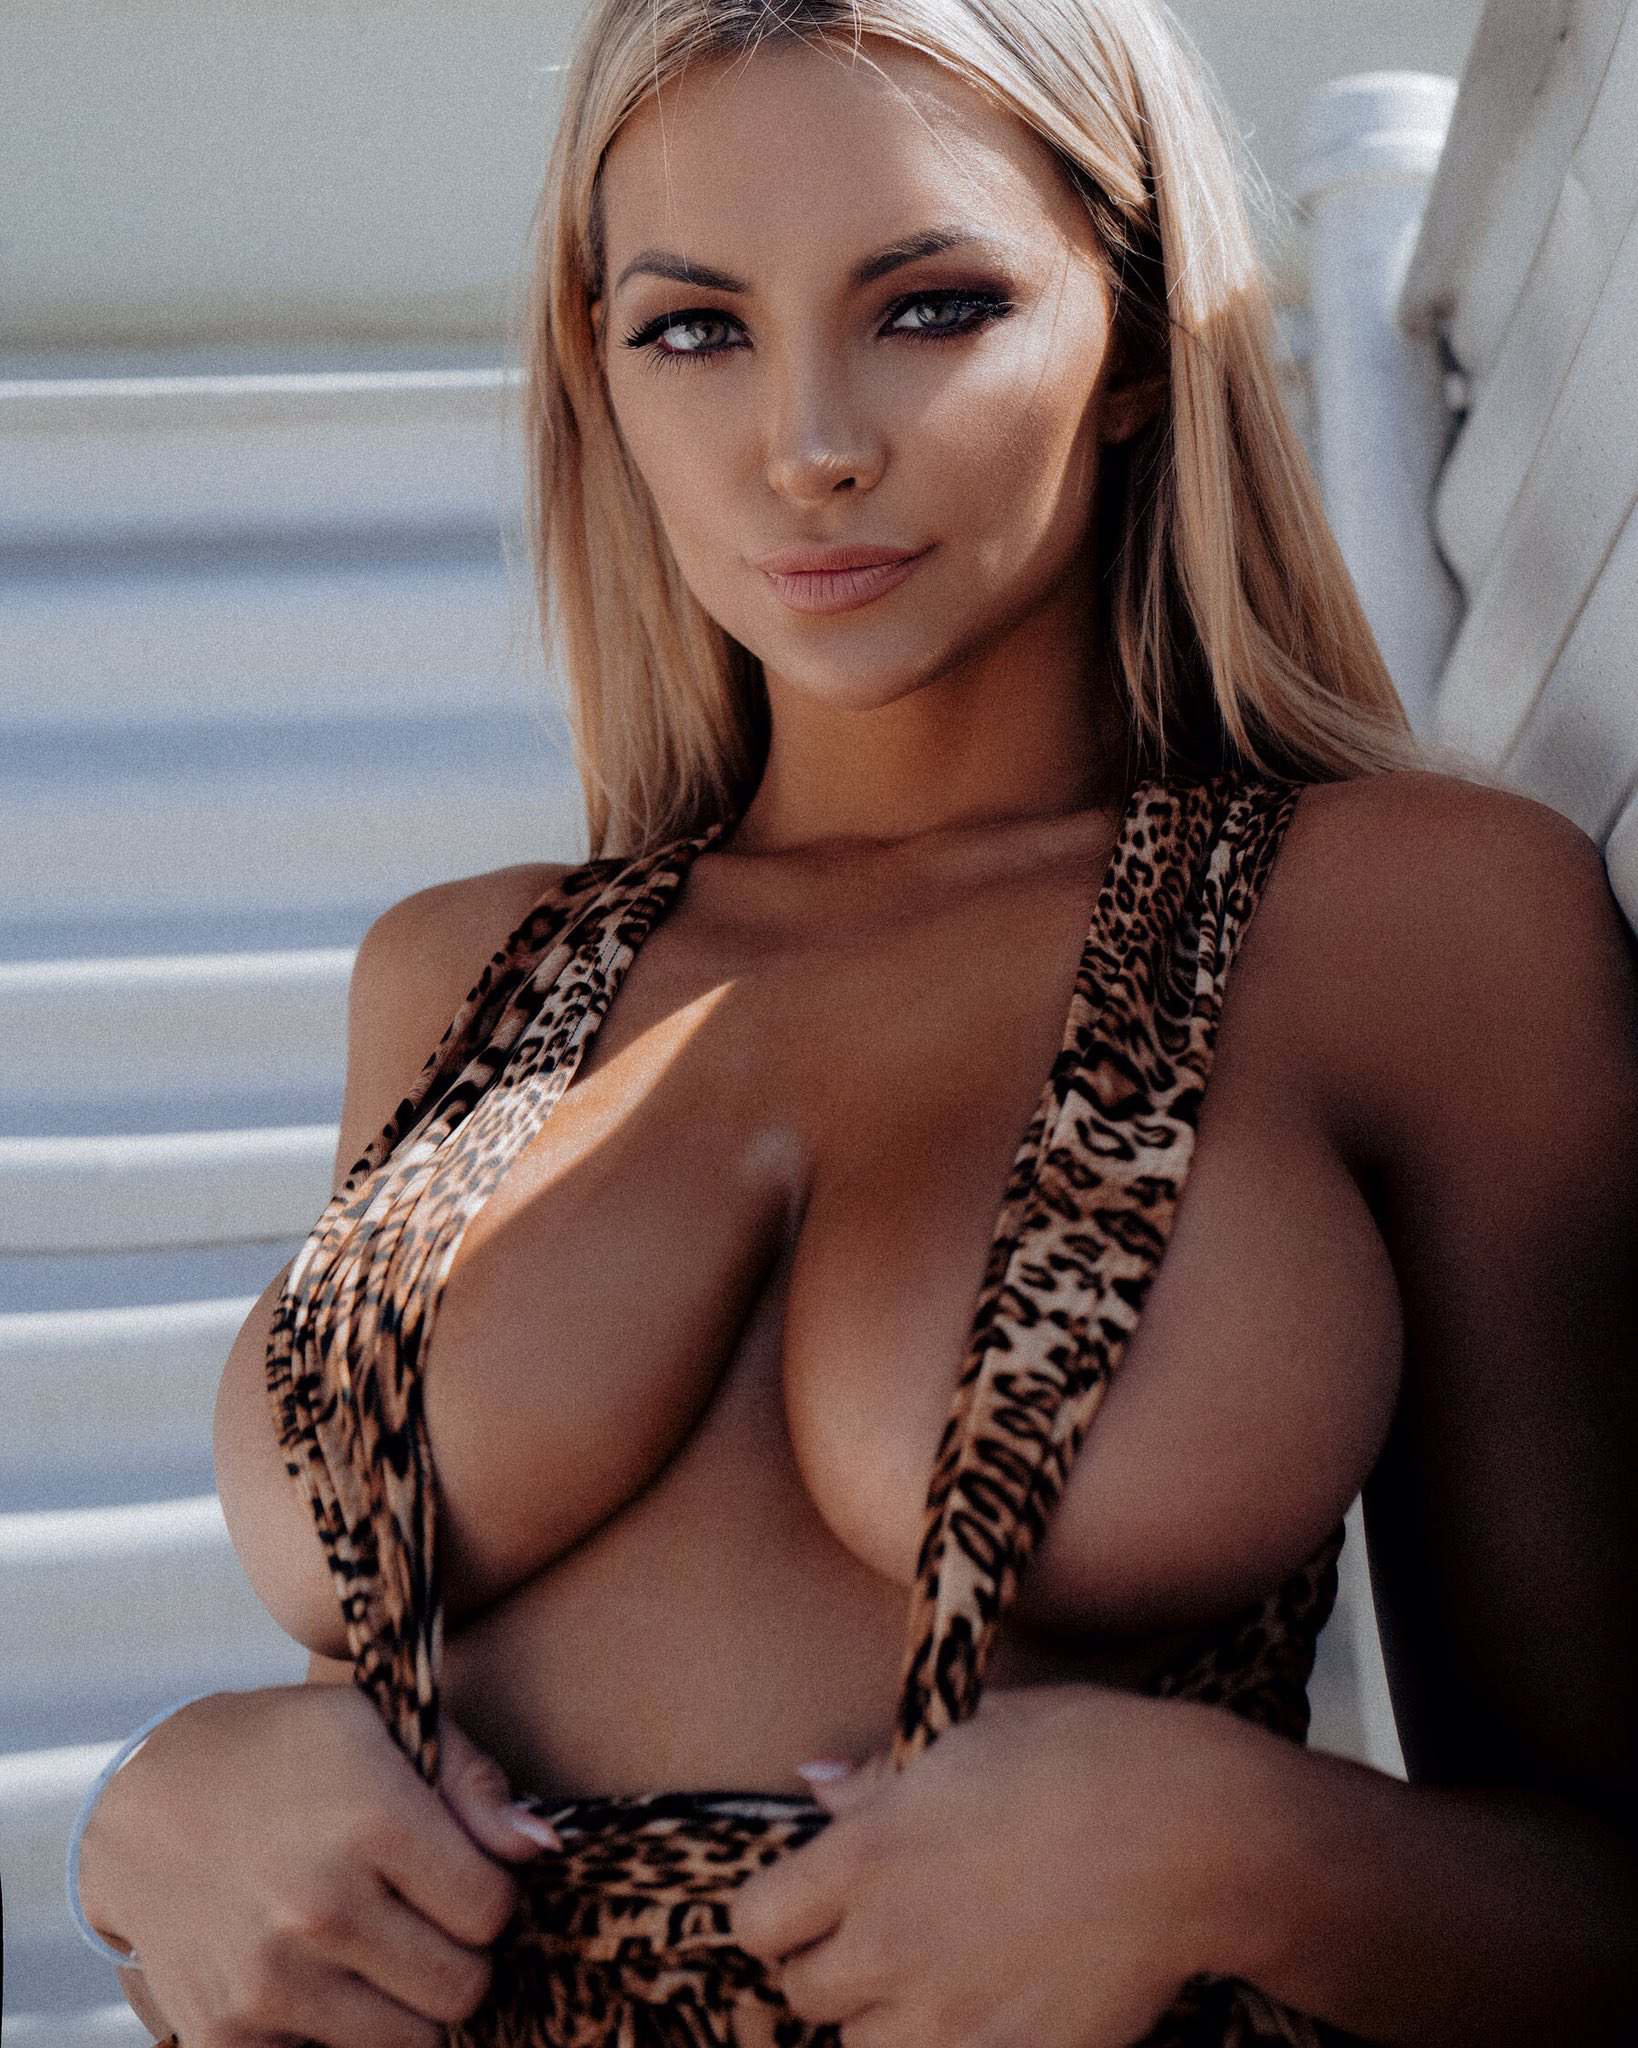 Lindsey Pelas Wet Boobs - 7 Photos Video nudes (48 photo), Sexy Celebrity fotos